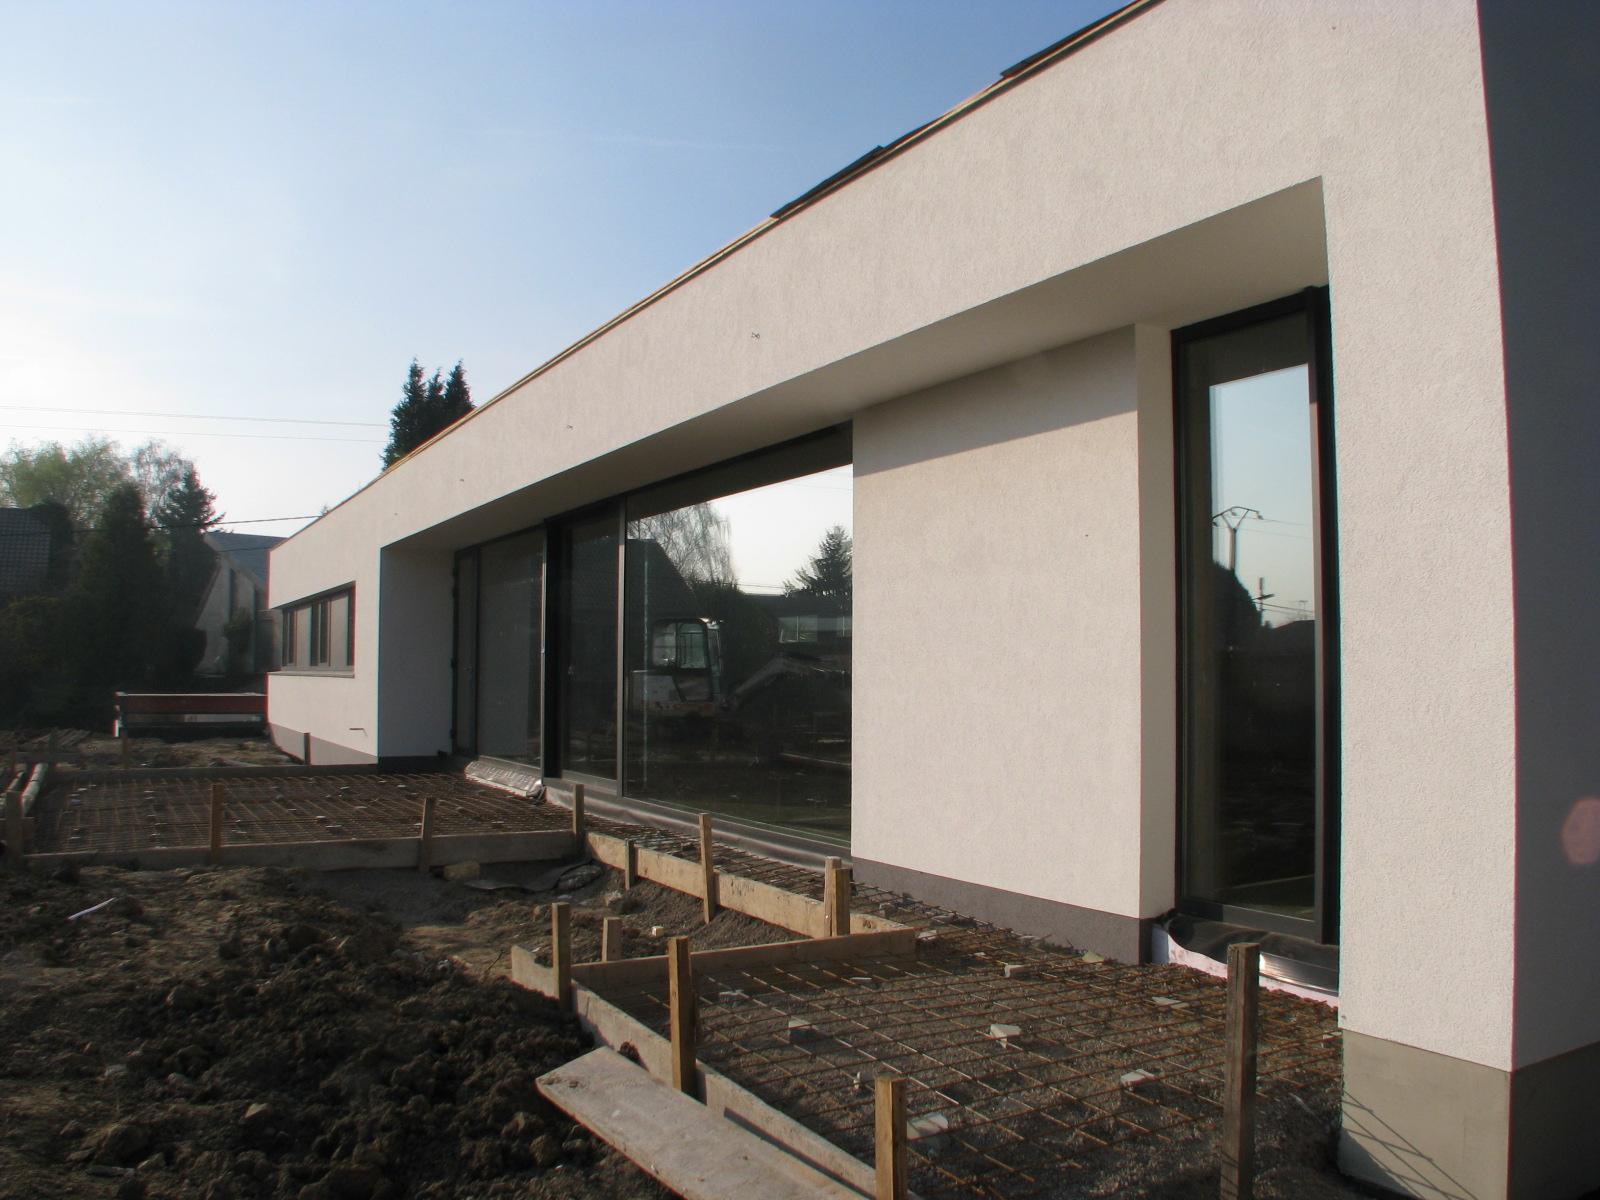 HD wallpapers maison moderne vendre brabant wallon bhdwallclove.ml